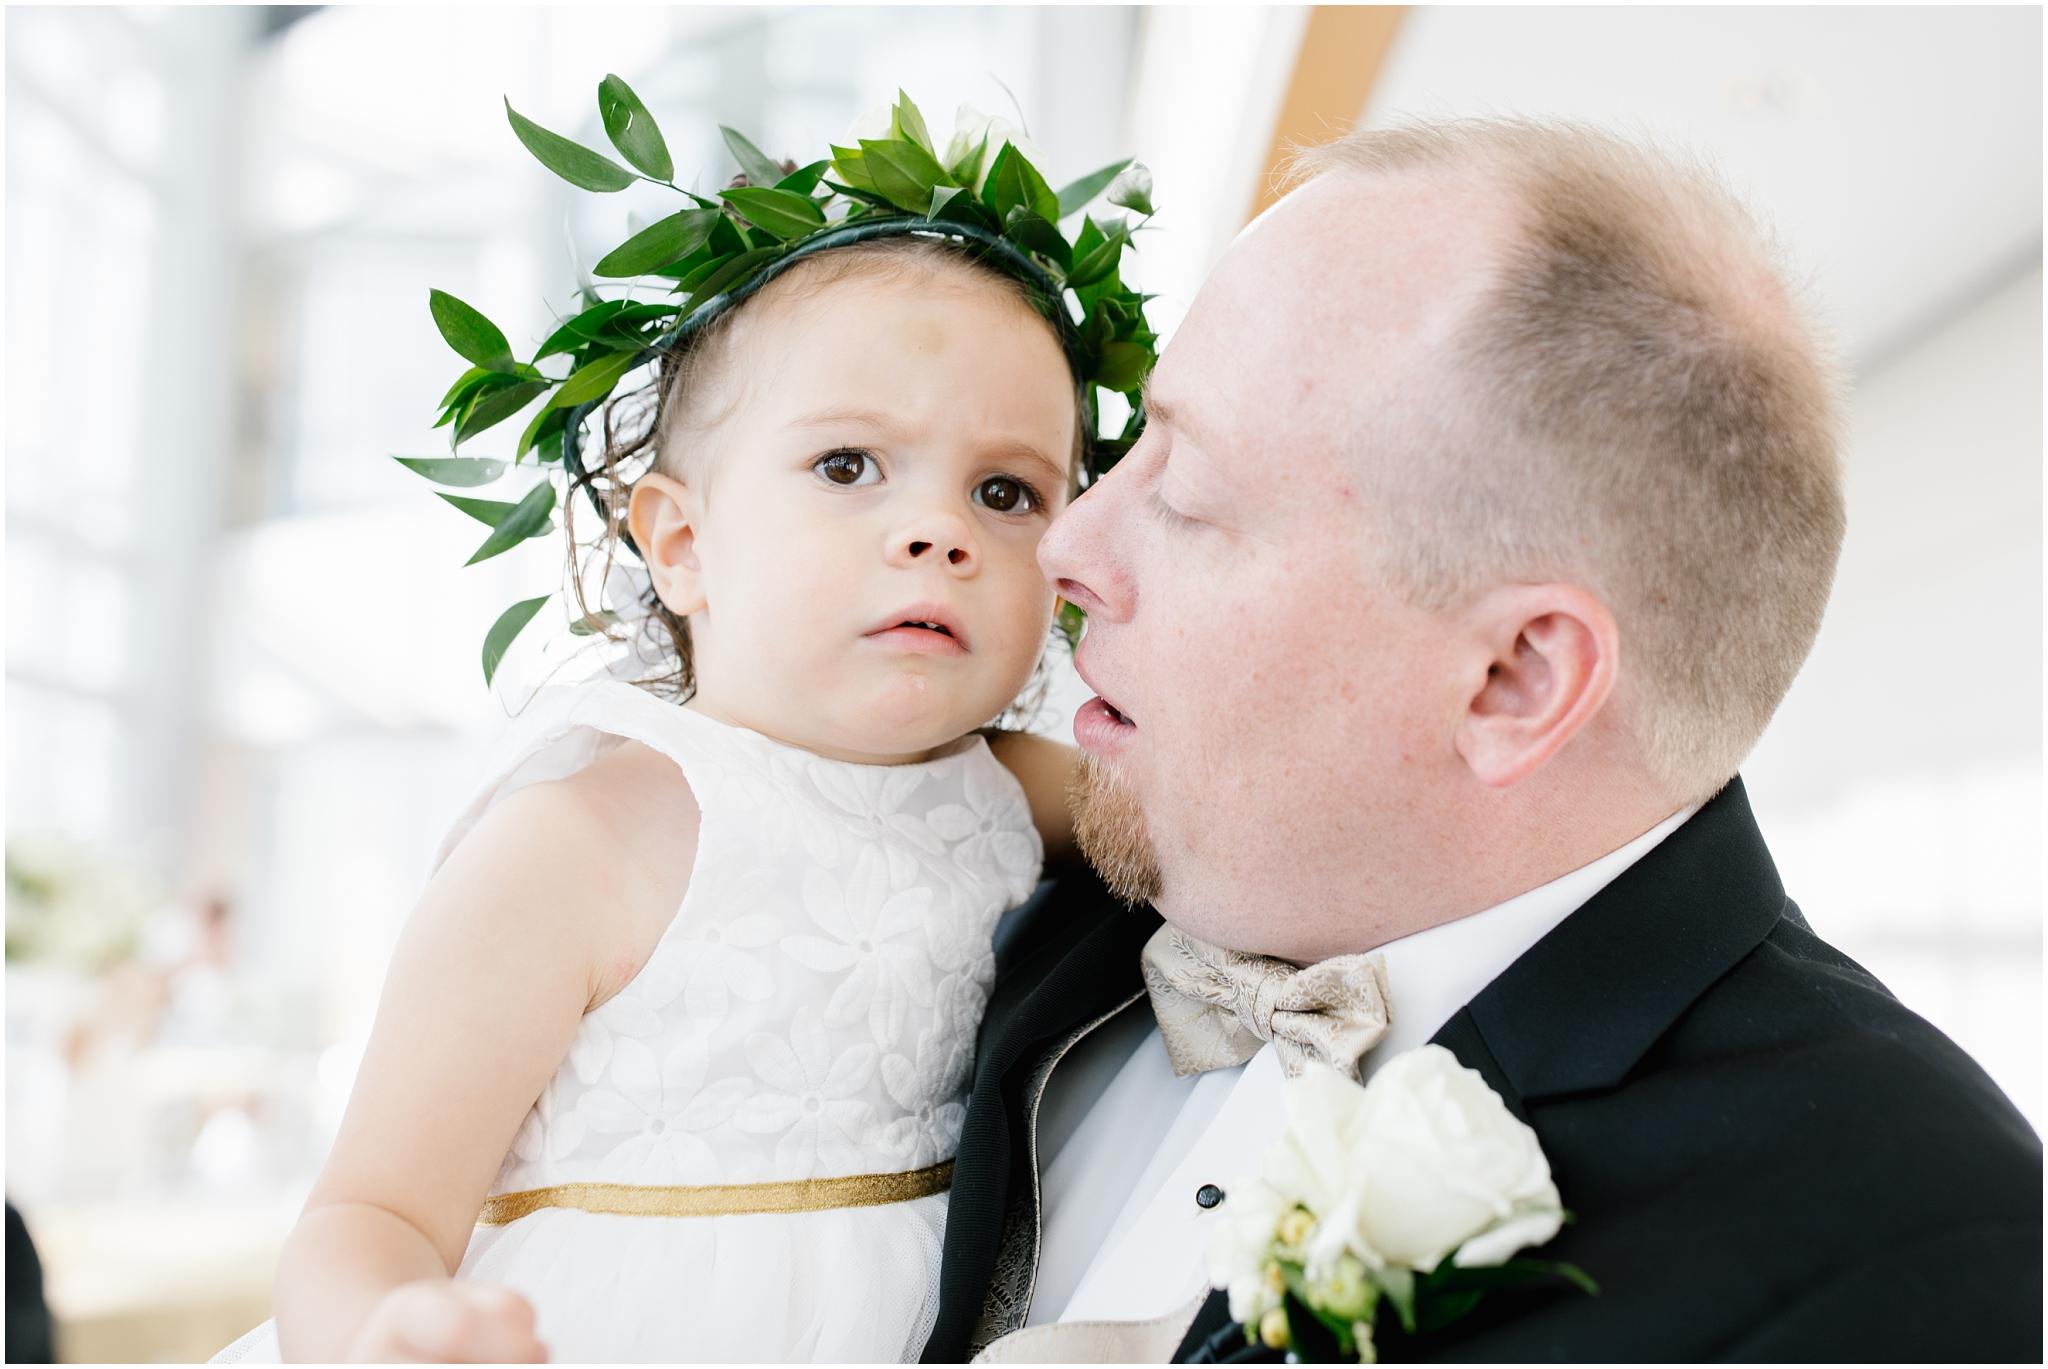 CherylandTyler-344_Lizzie-B-Imagery-Utah-Wedding-Photographer-Salt-Lake-City-Temple-Wells-Fargo-Building-Reception.jpg